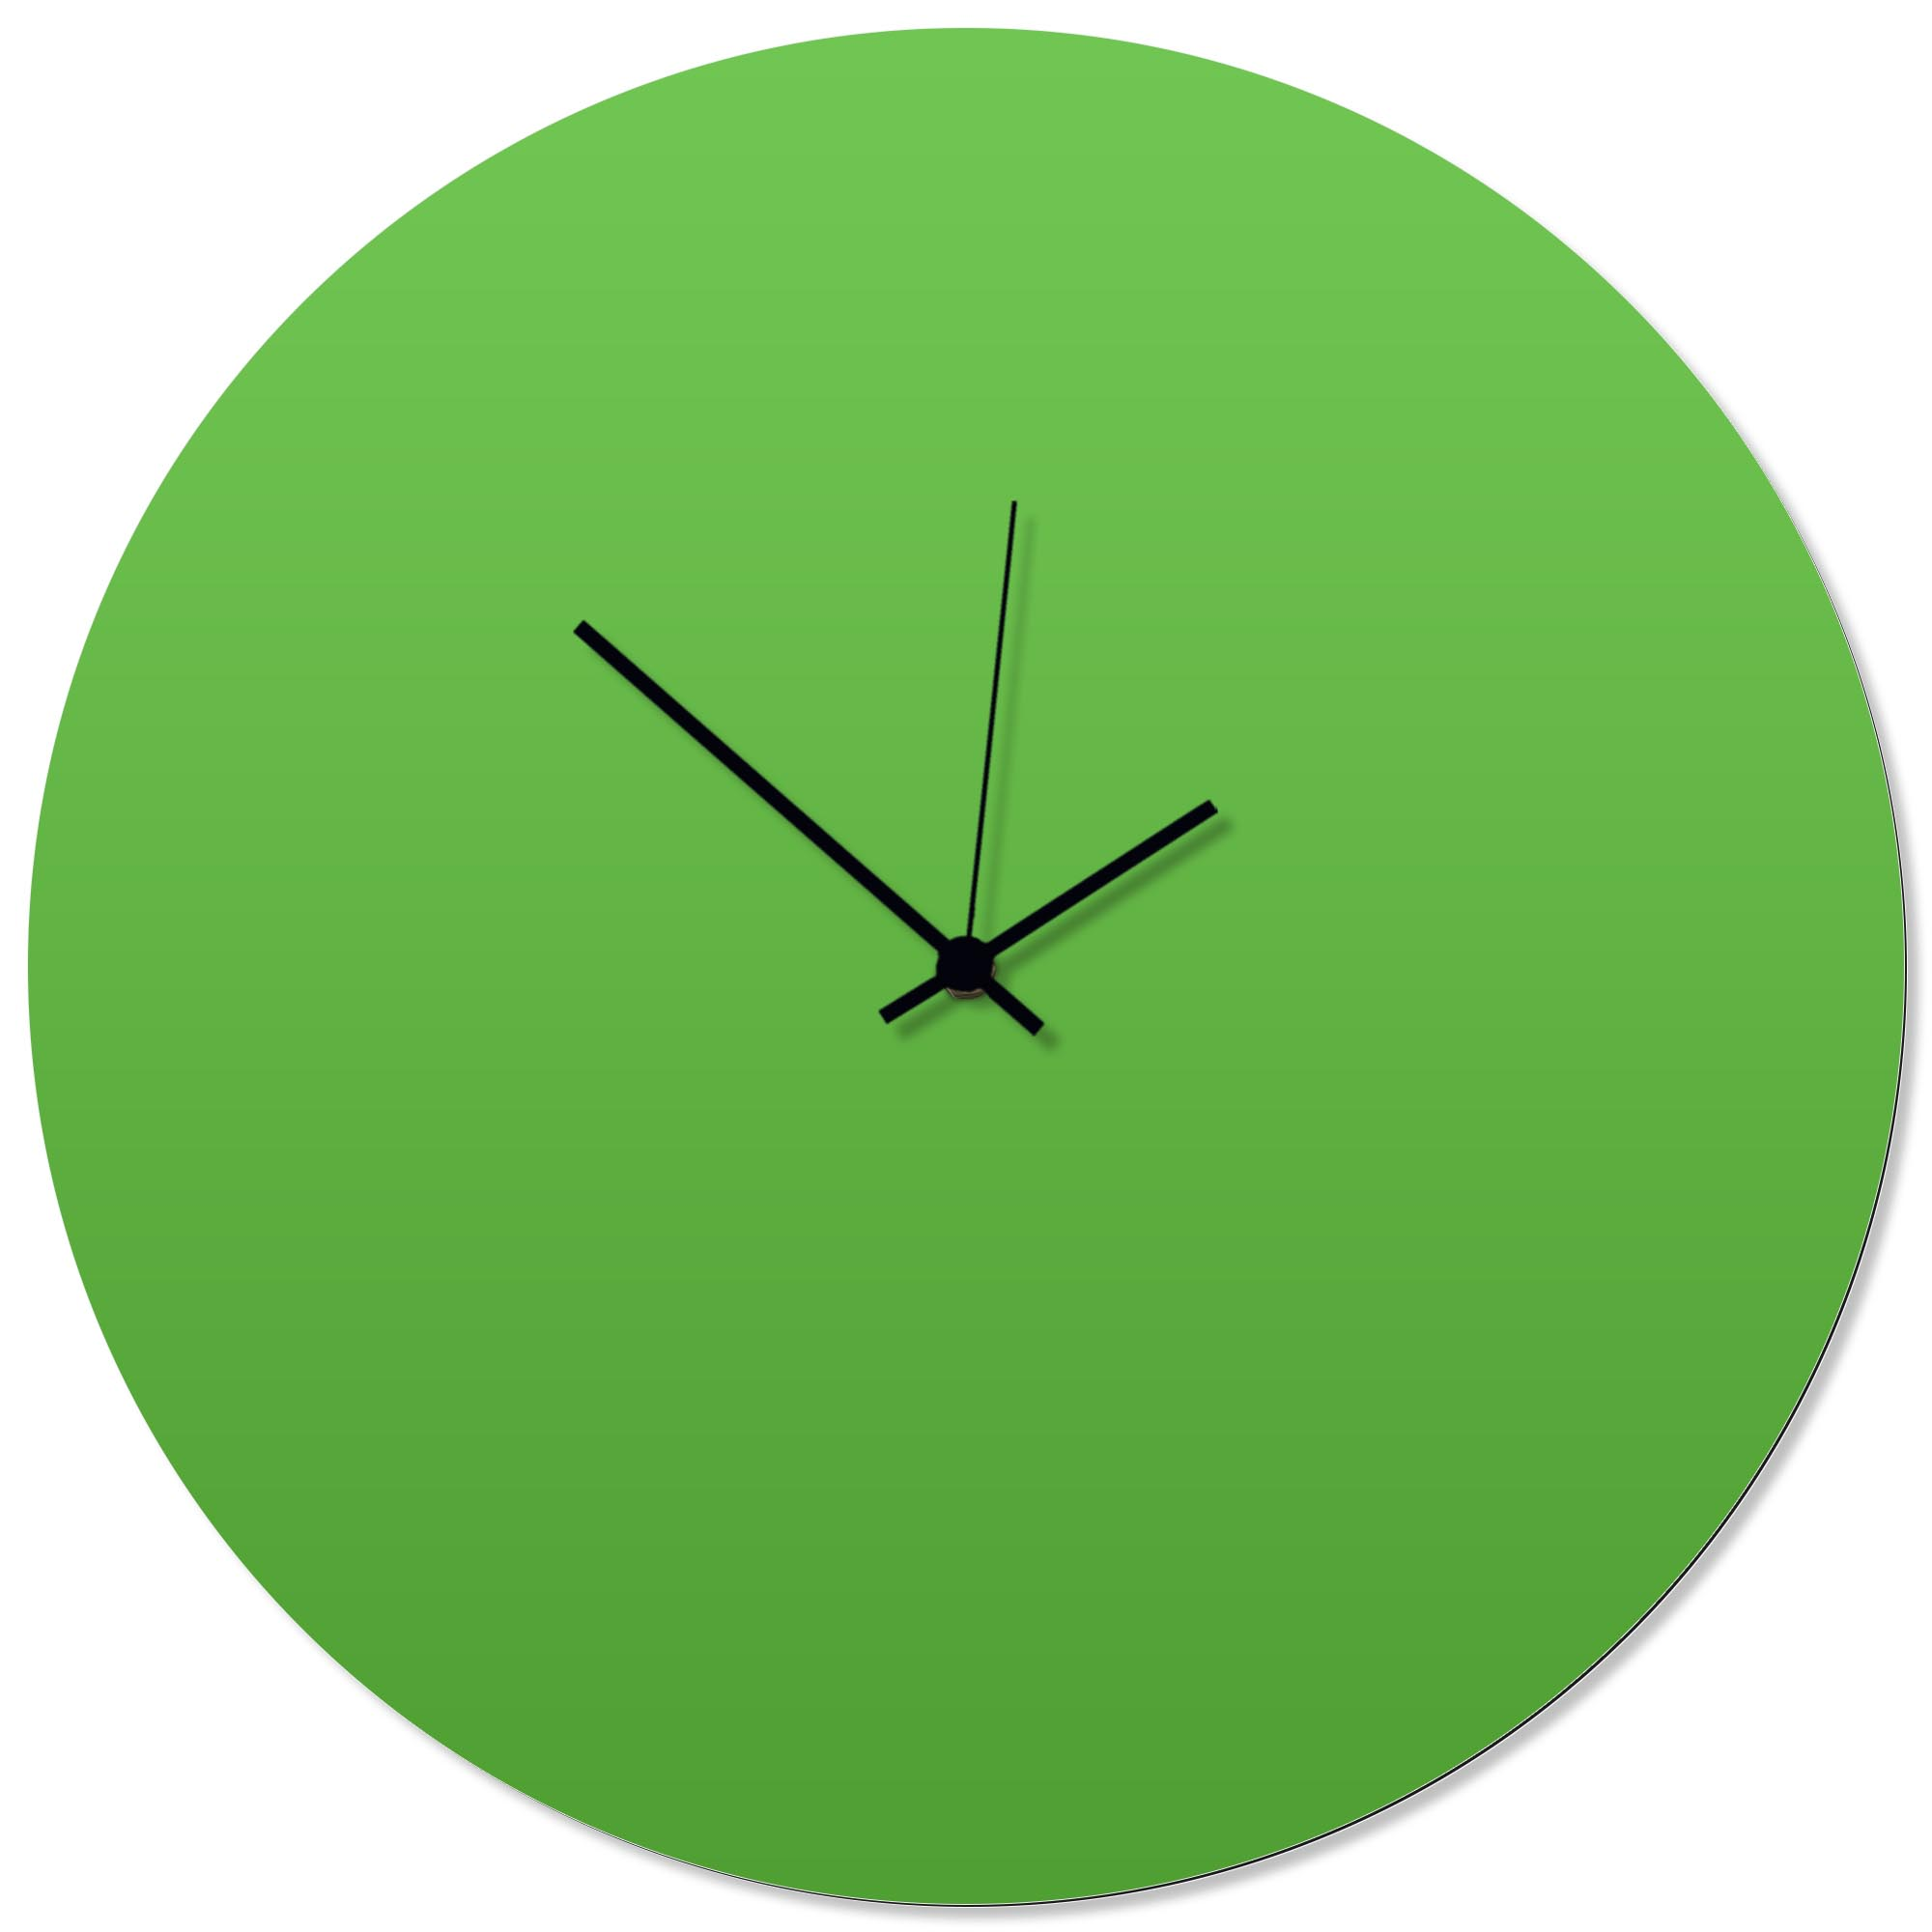 Greenout Black Circle Clock Large 23x23in. Aluminum Polymetal